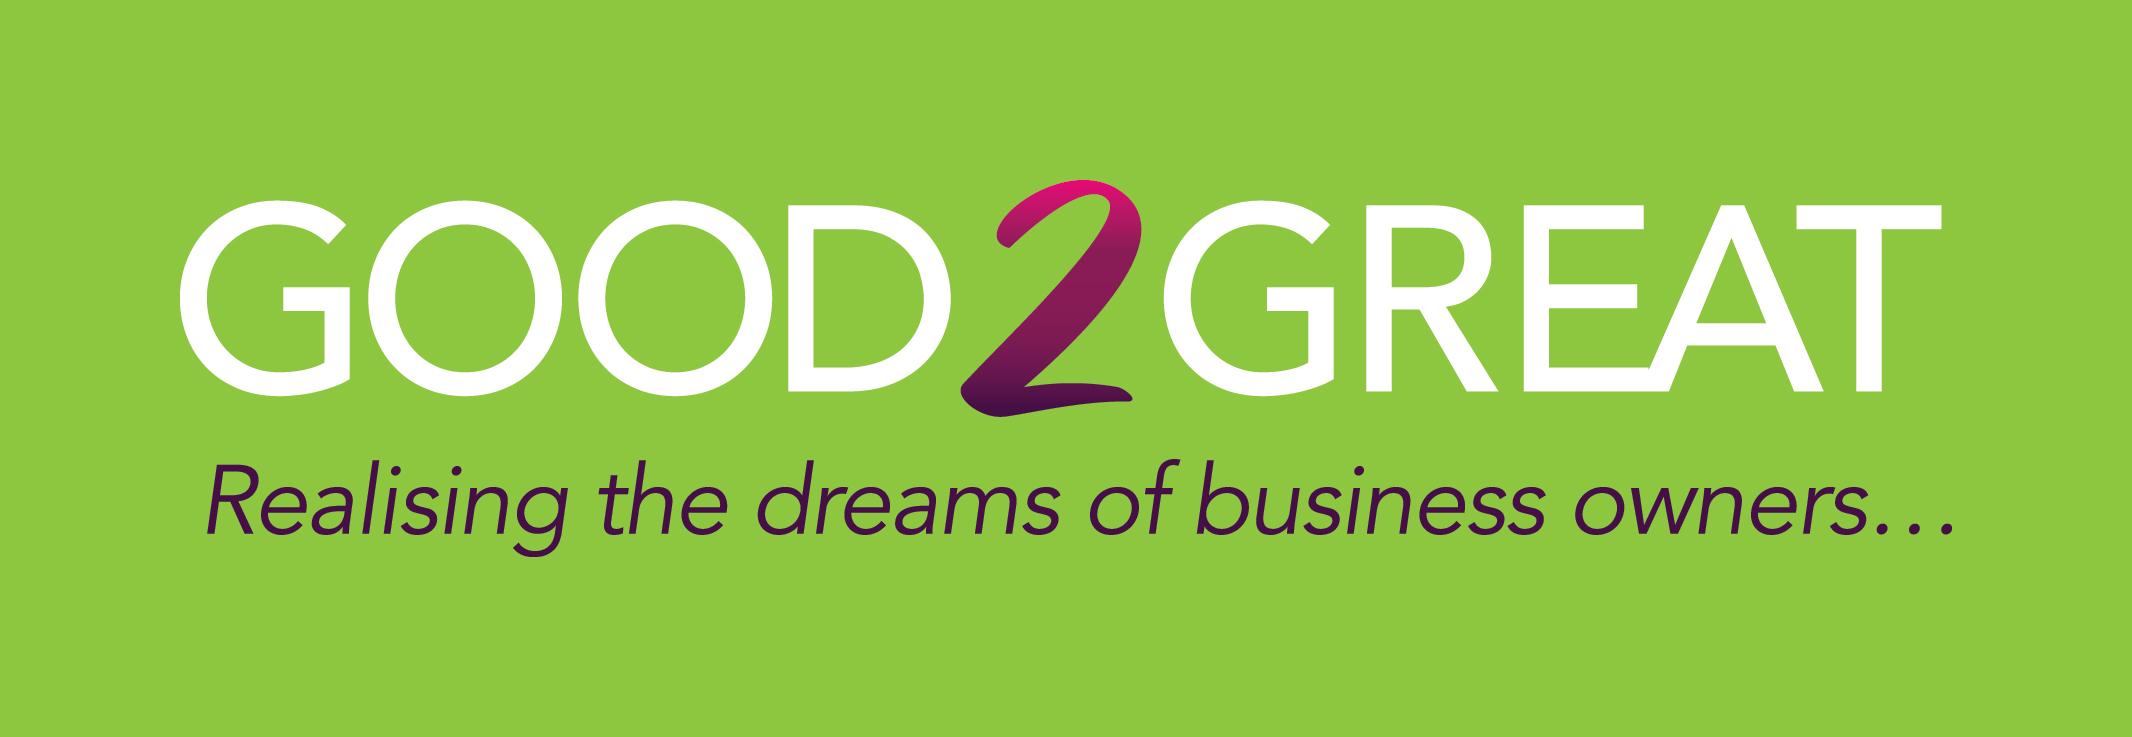 Good2great logo